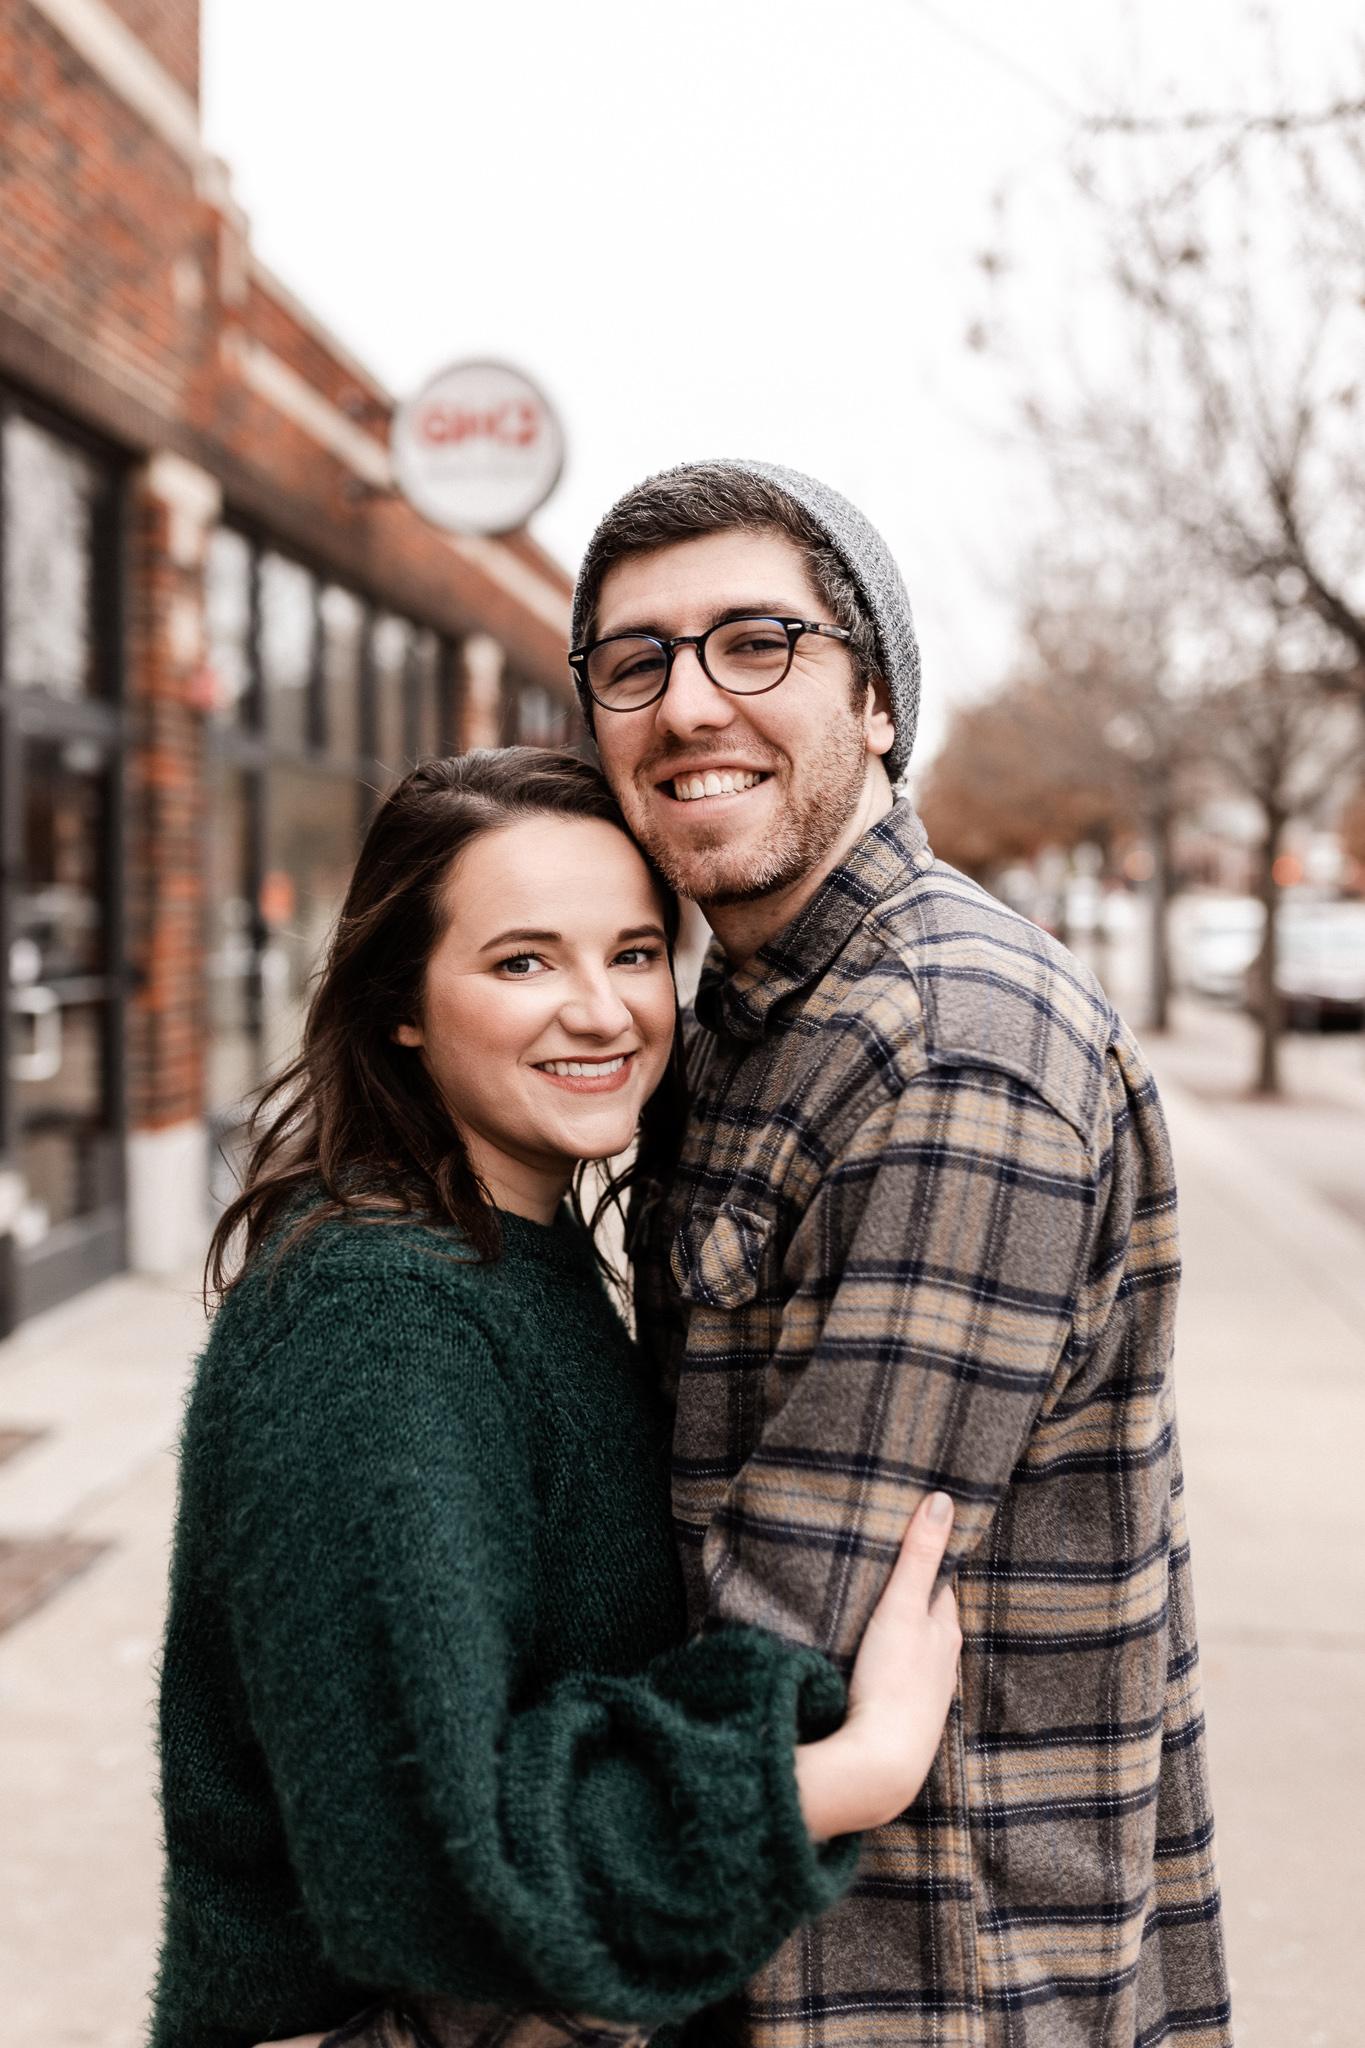 Seamus + Lauren | Modern Downtown Engagements | Oklahoma Wedding Photographer-41.jpg